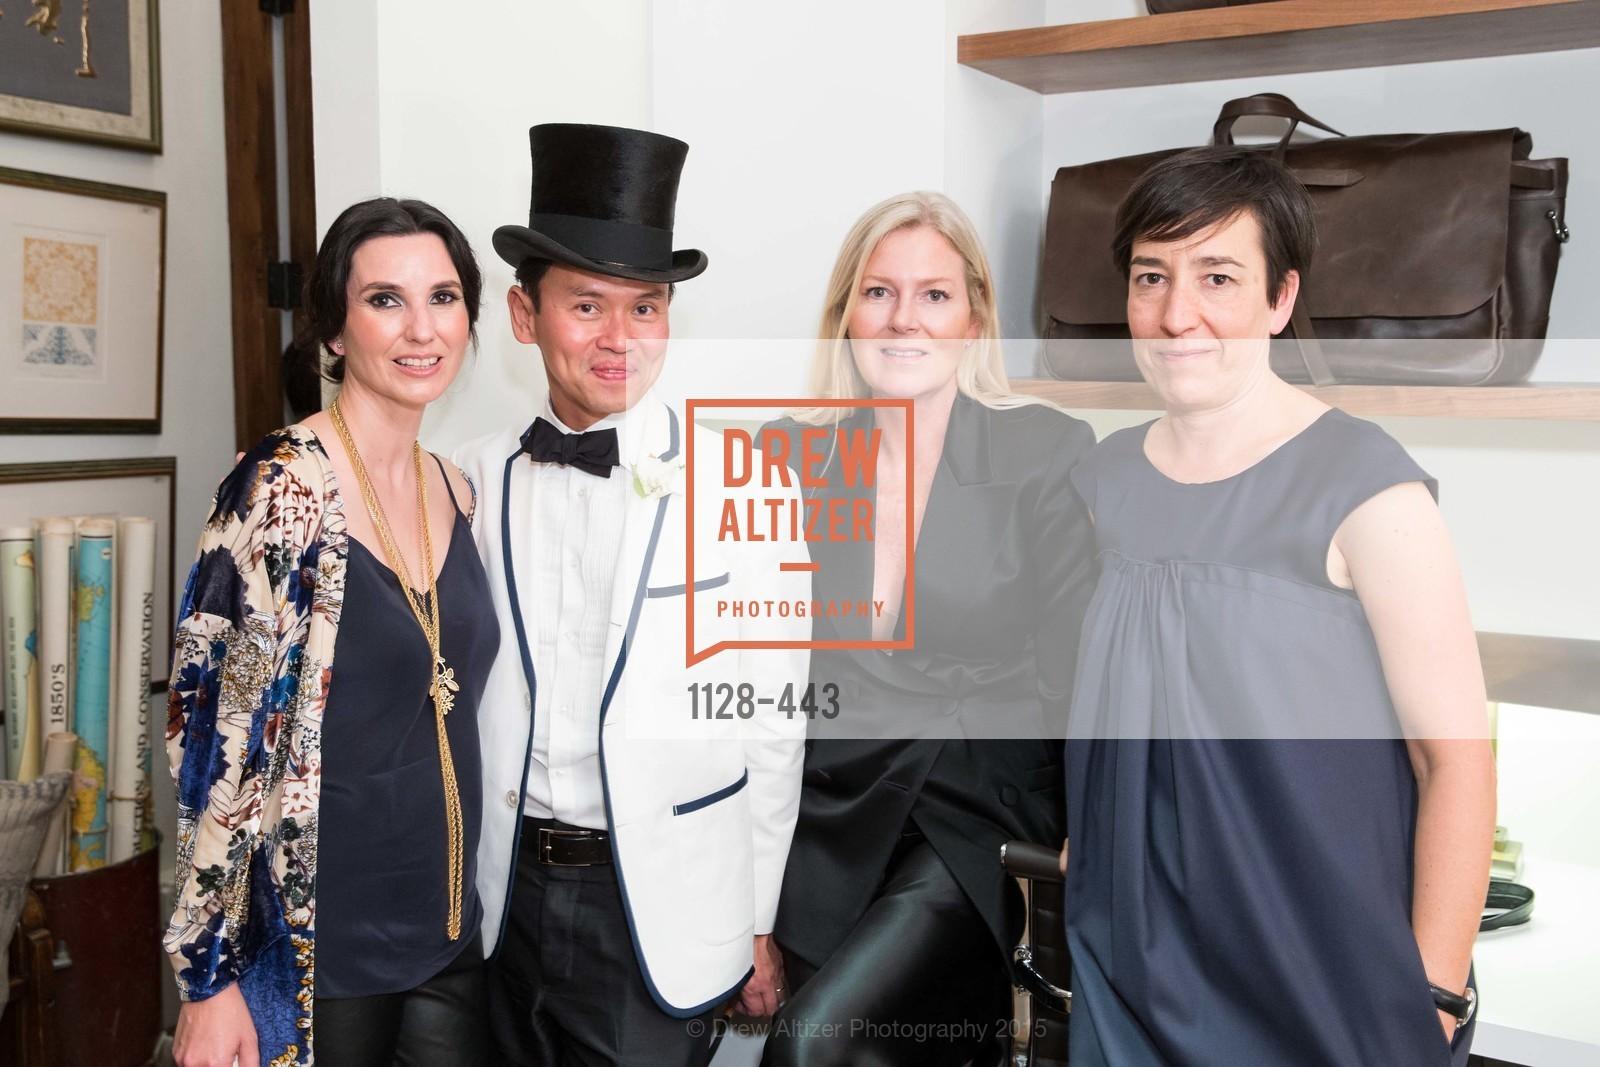 Luisa Serna-Borga, Jonathan Rachman, Margot Larkin, Judith Ibanez, J.RACHMAN GRAND OPENING AND BOOK SIGNING BY ALISON CARLSON